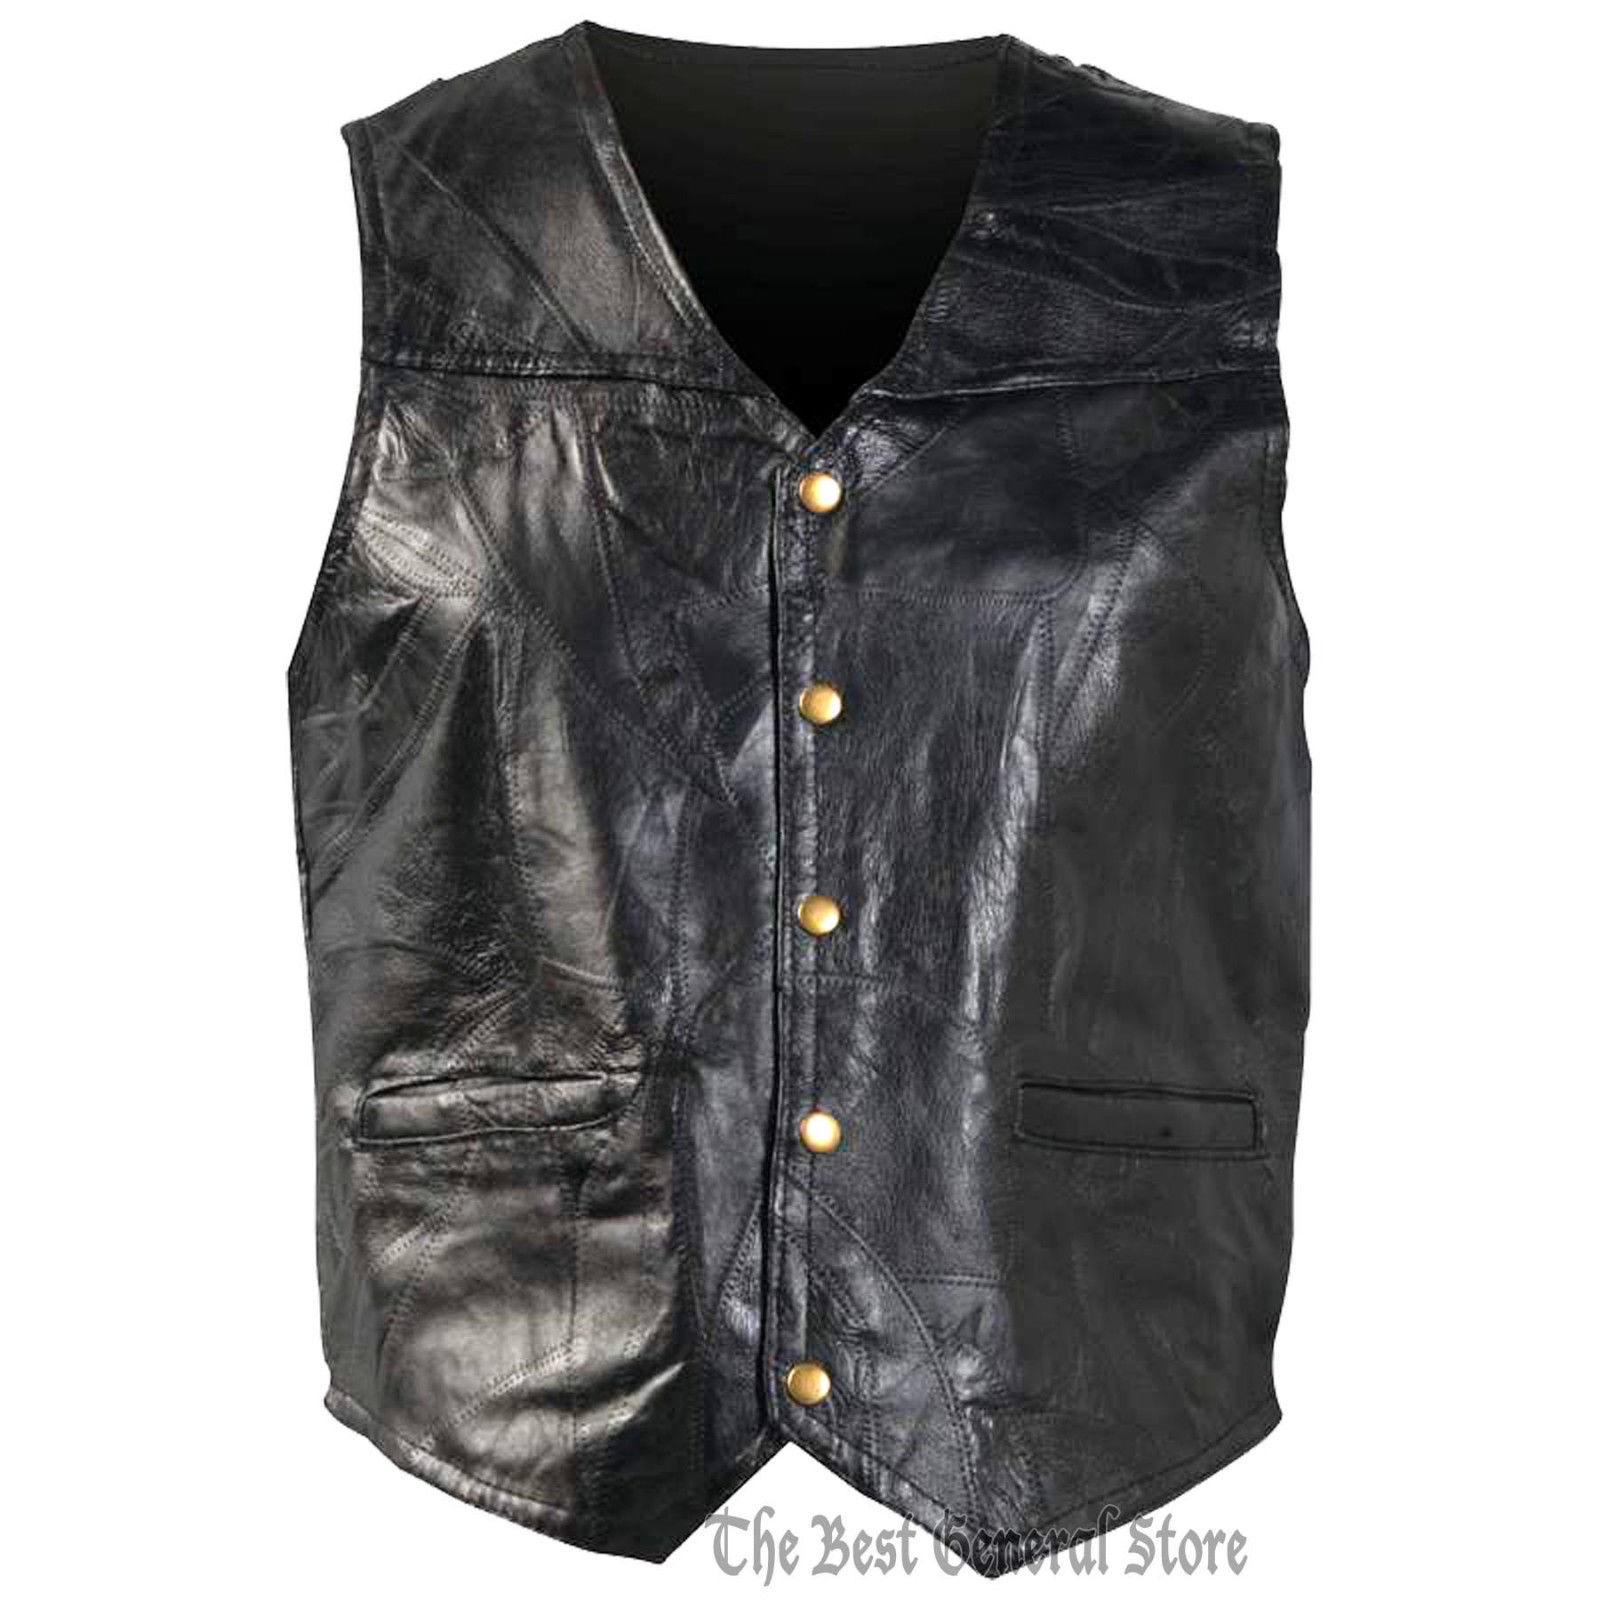 Mens SMALL Genunie Leather Motorcycle Biker Vest Italian Design Leather Jacket